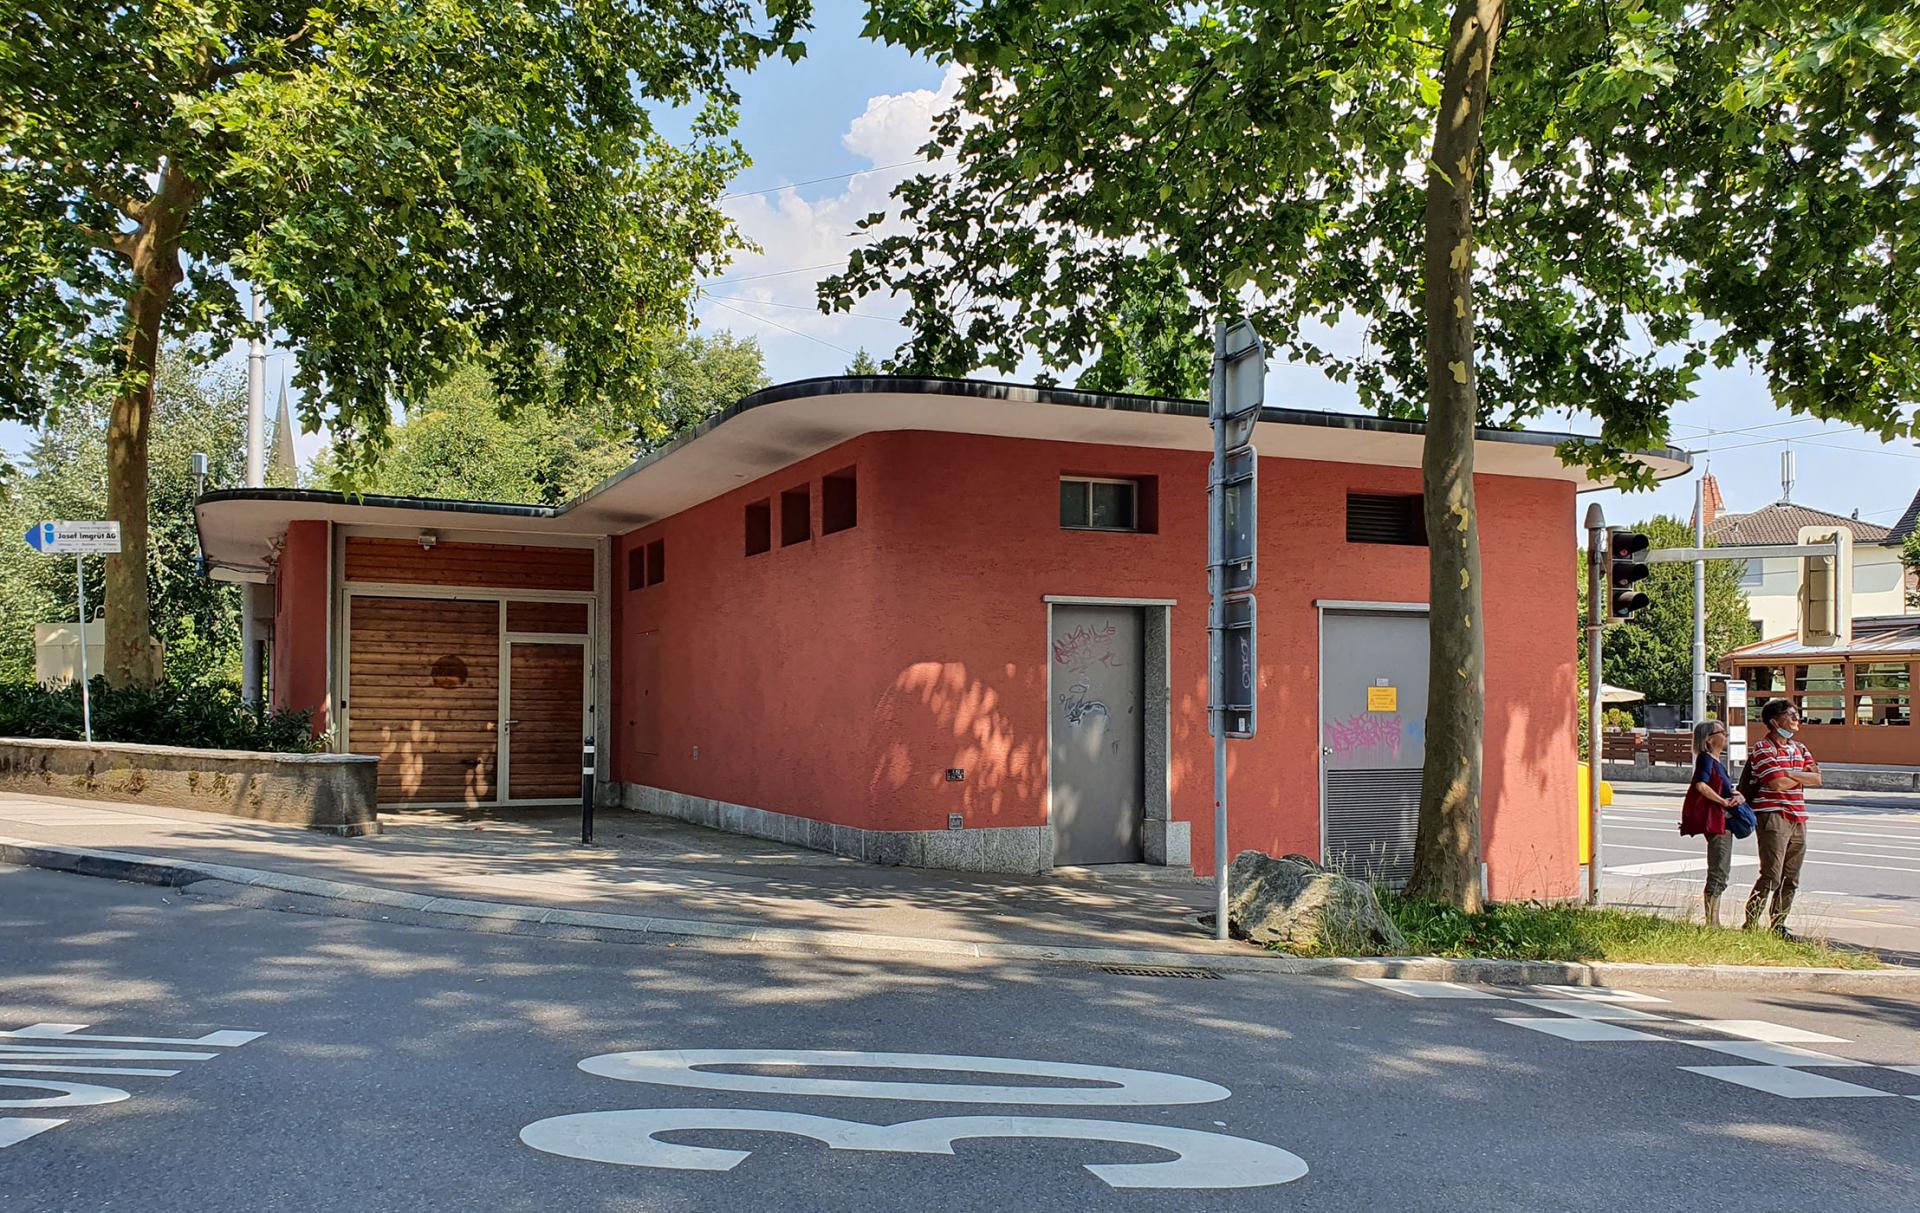 buan-architekten-kiosk eichhof-luzern-denkmalschutz-haus-2